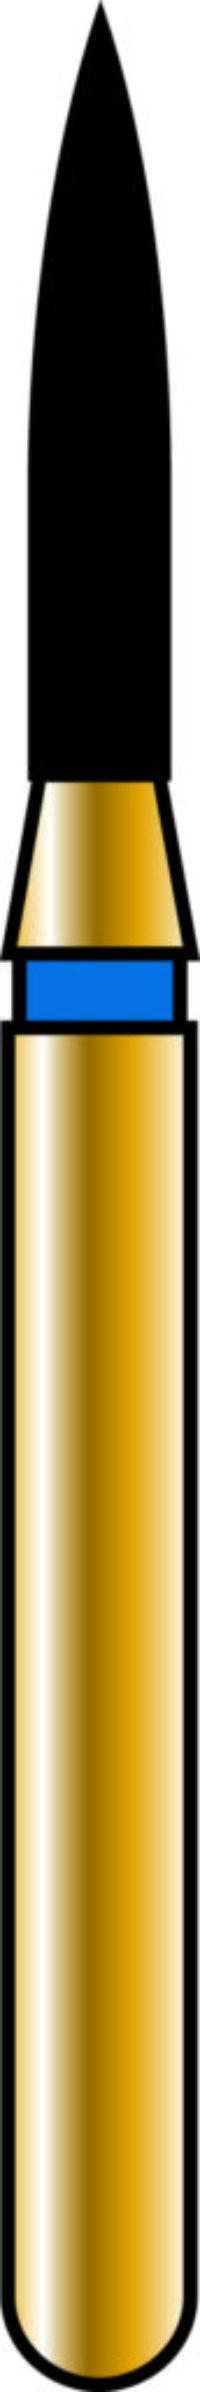 Flame 12-6.5mm Gold Diamond Bur - Fine Grit